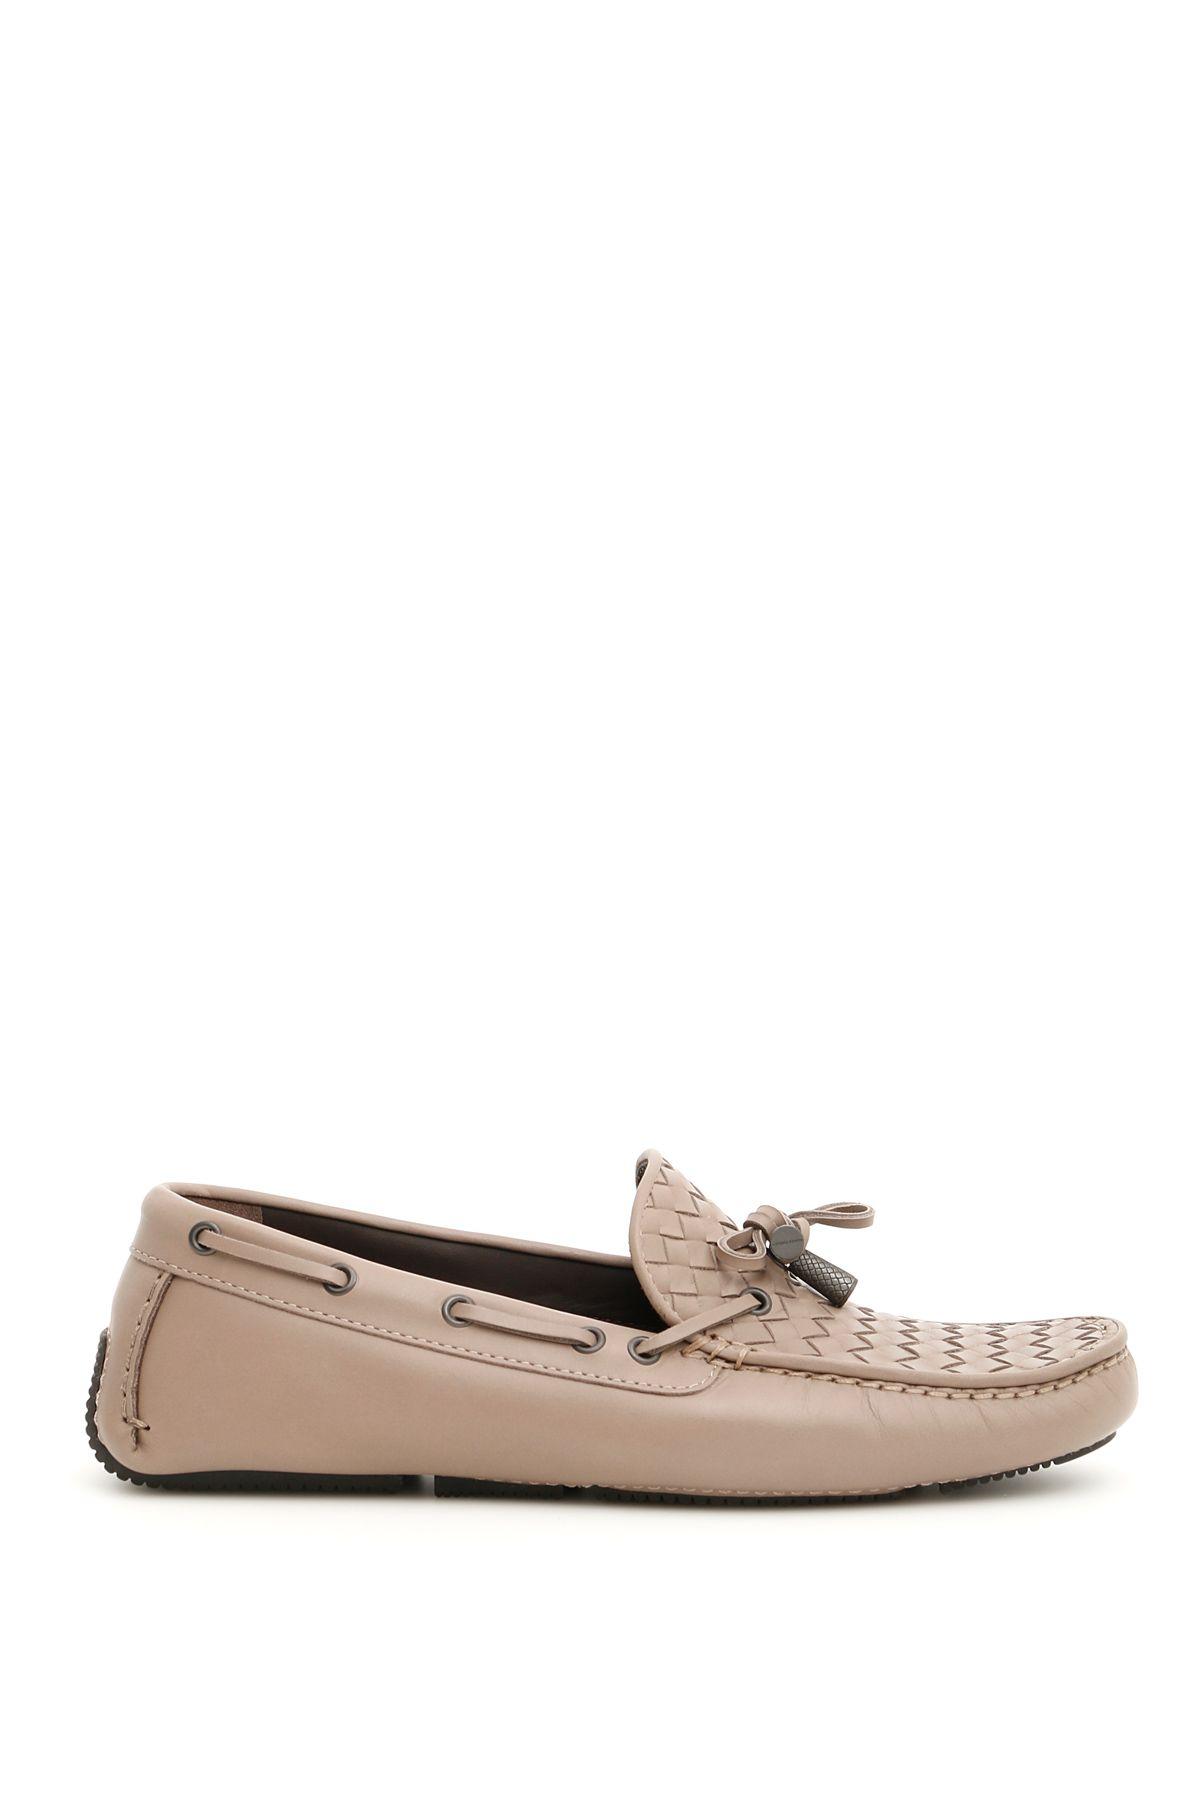 Bottega Veneta Intreccio Driving Shoes